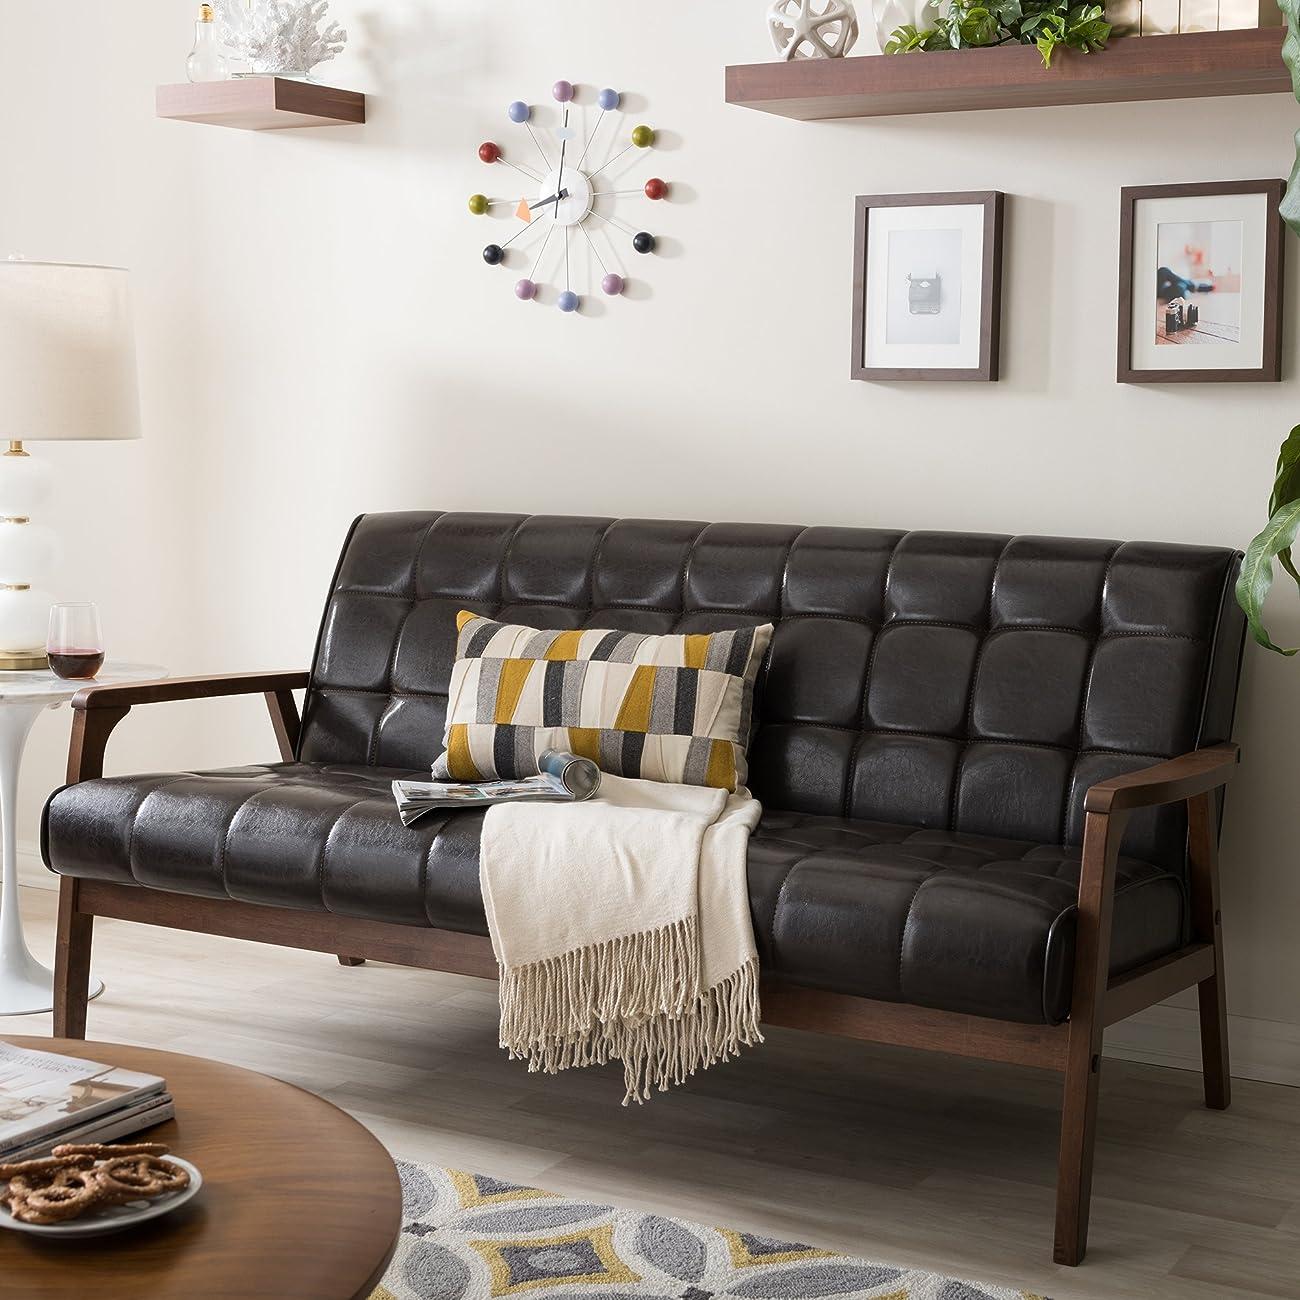 Baxton Studio Mid-Century Masterpieces Sofa, Brown 3